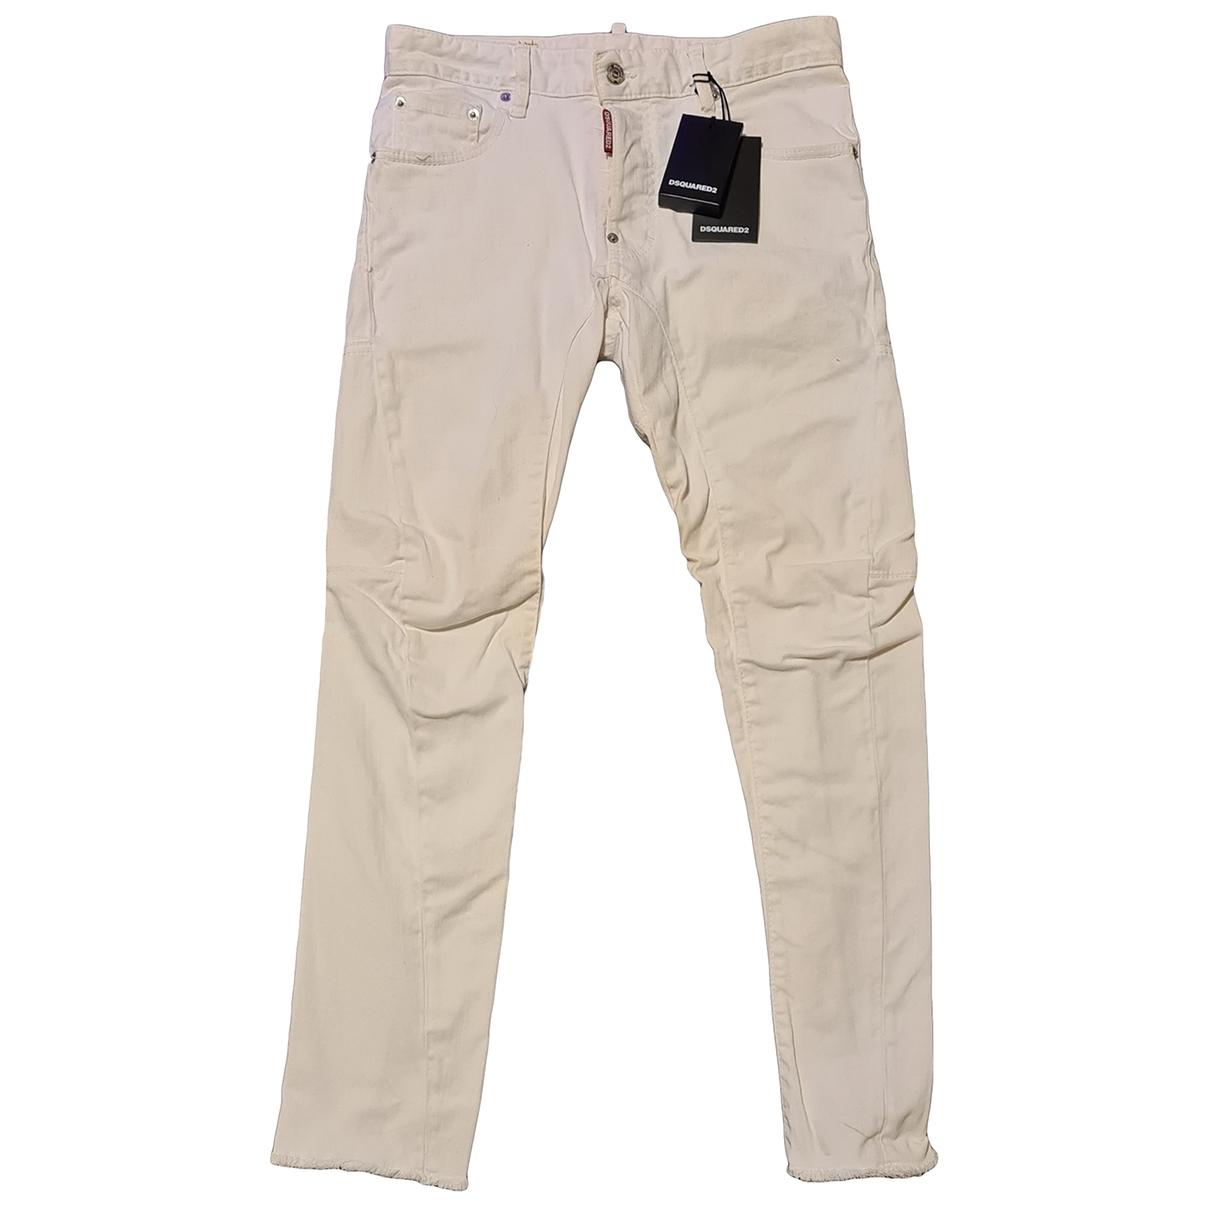 Dsquared2 \N White Cotton Jeans for Men 38 - 40 FR